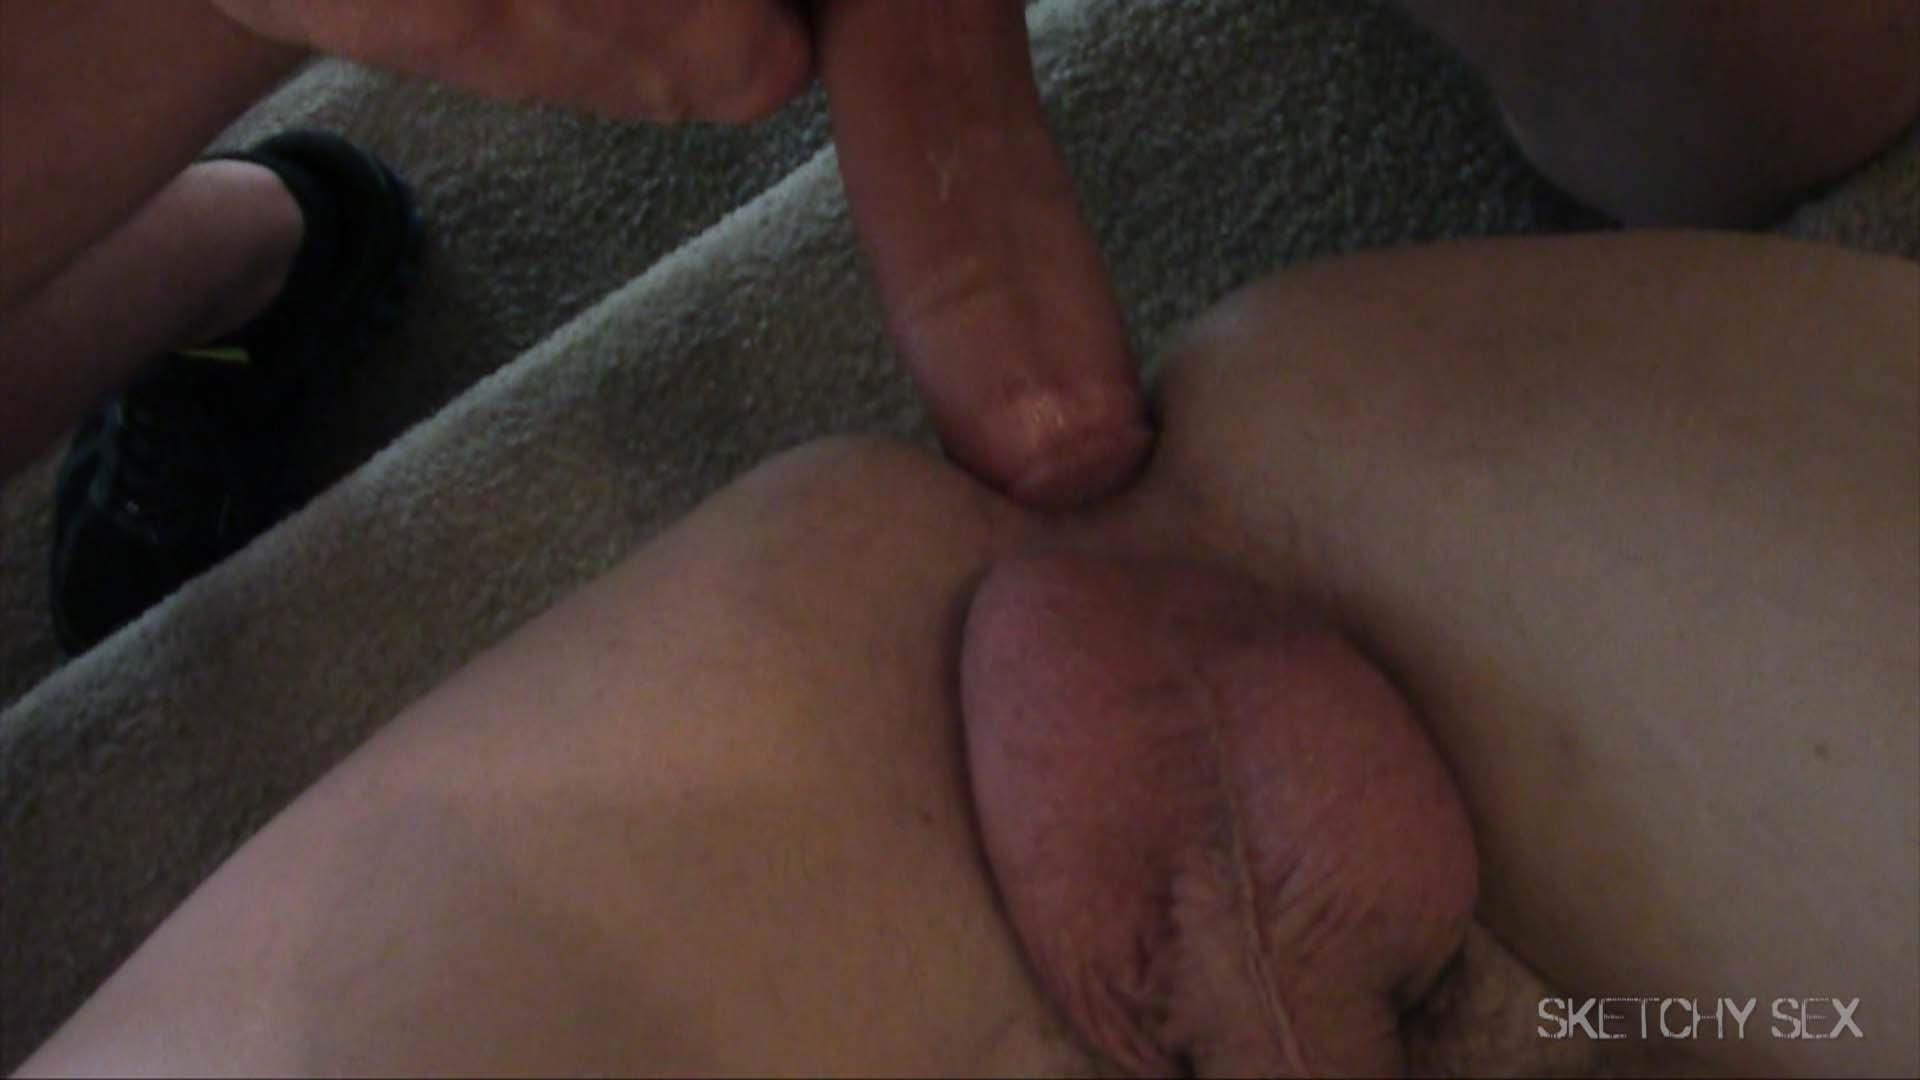 Sketchy Sex Bareback Breeding Anonymous Sex Amateur Gay Porn 07 Three Hung Guys Breeding A Slutty Jock Hole